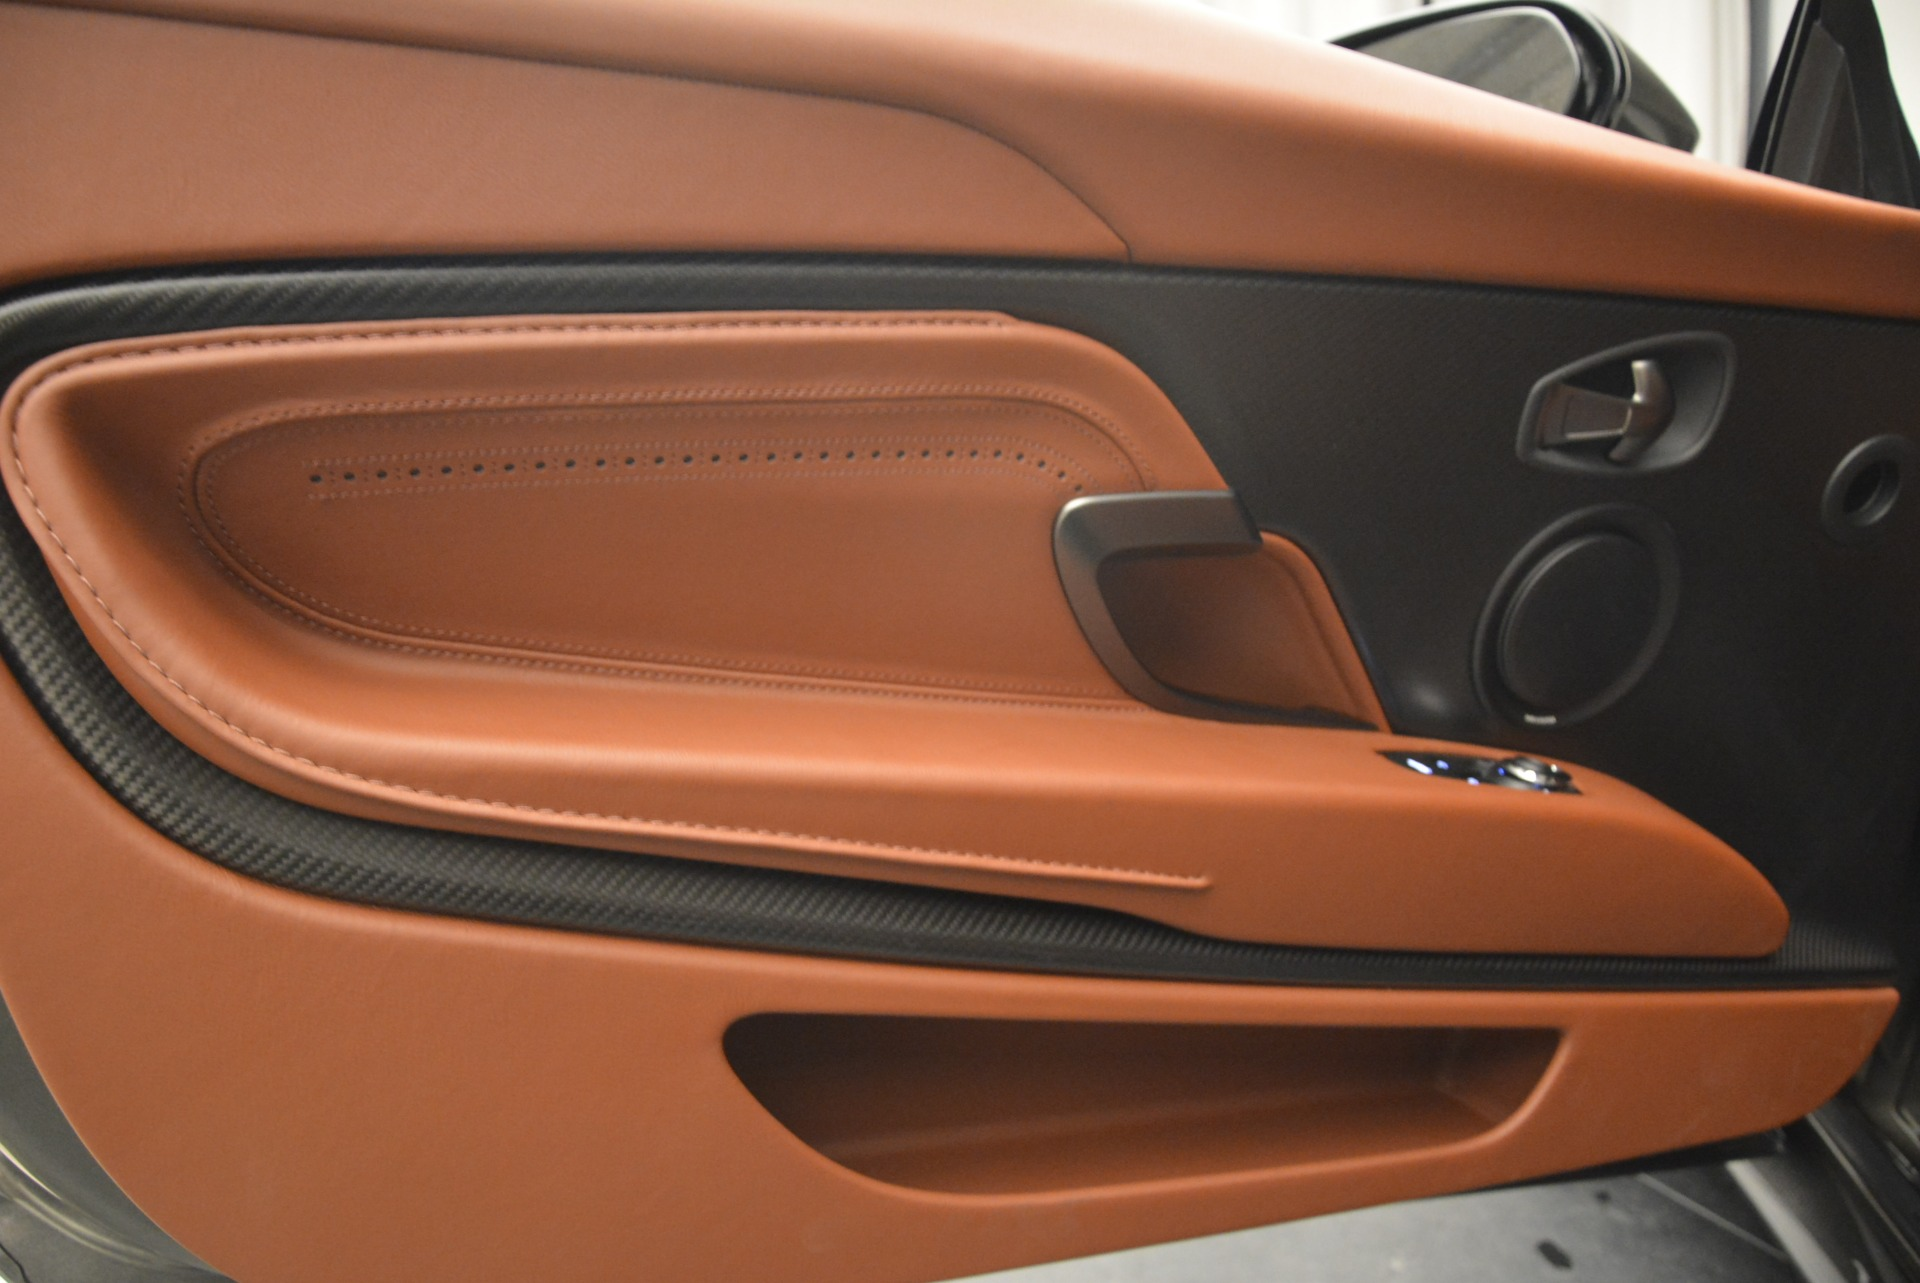 New 2019 Aston Martin DB11 Volante  For Sale In Westport, CT 2209_p30